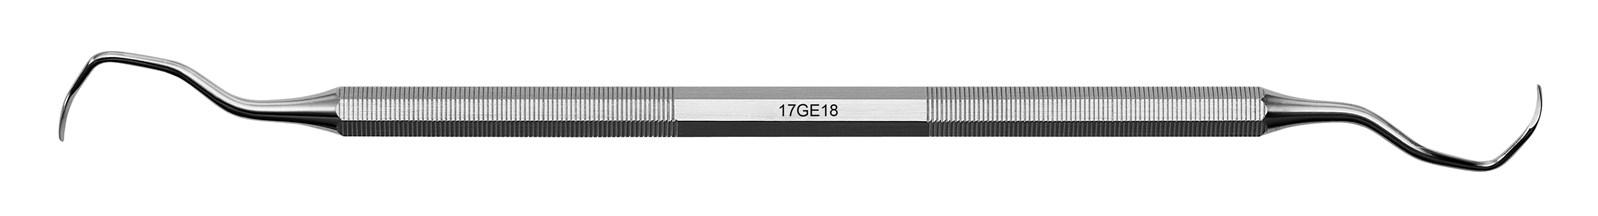 Kyreta Gracey Classic - 17GE18, Bez návleku